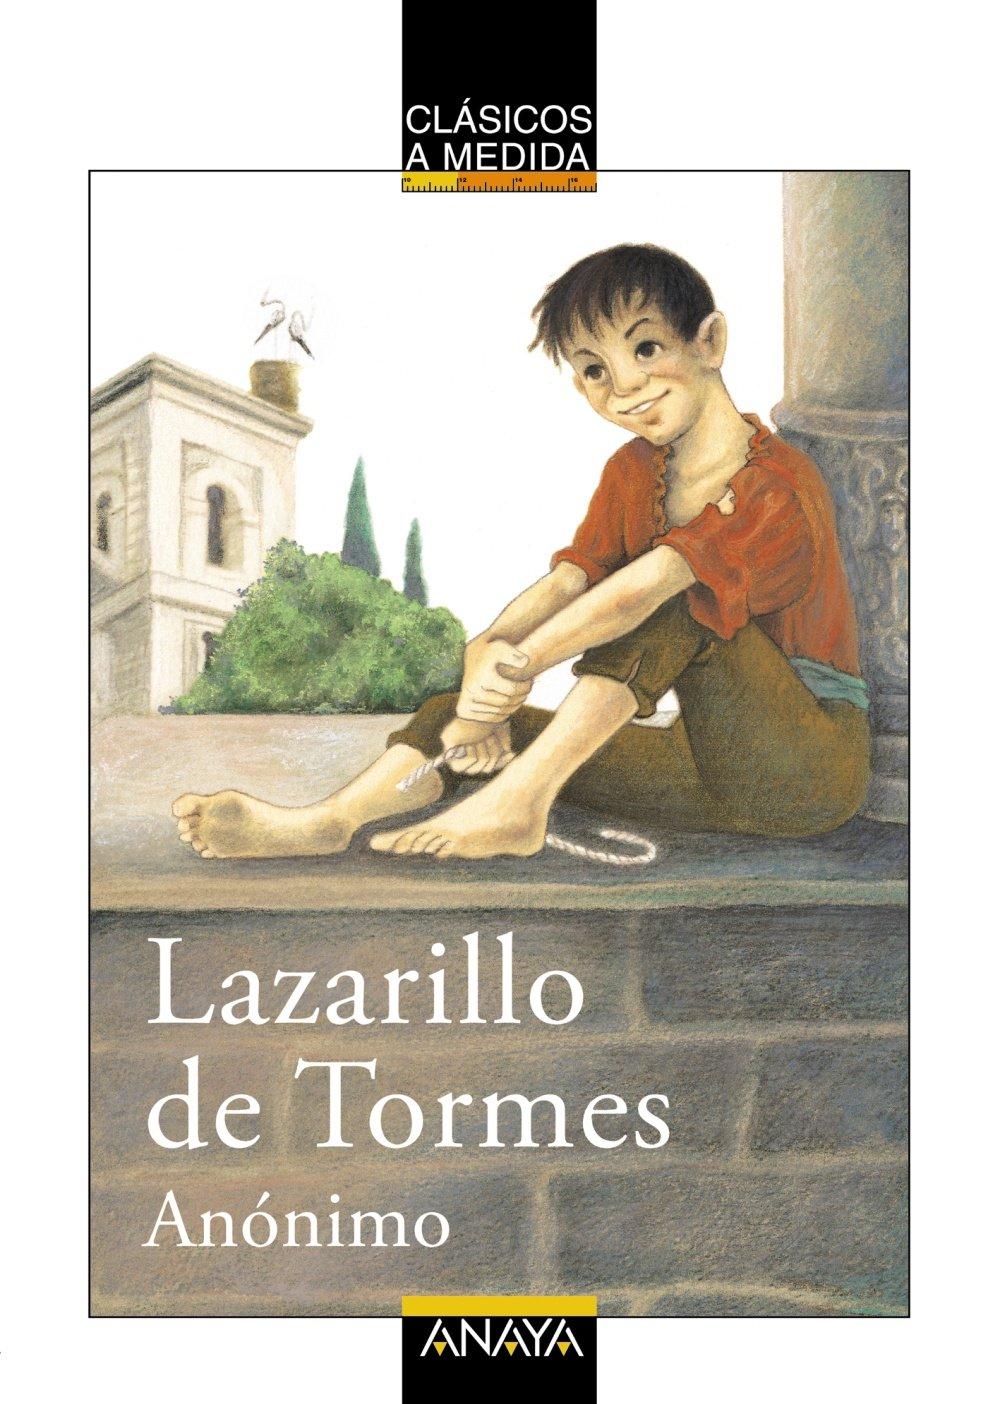 Lazarillo de Tormes (Clásicos - Clásicos A Medida)